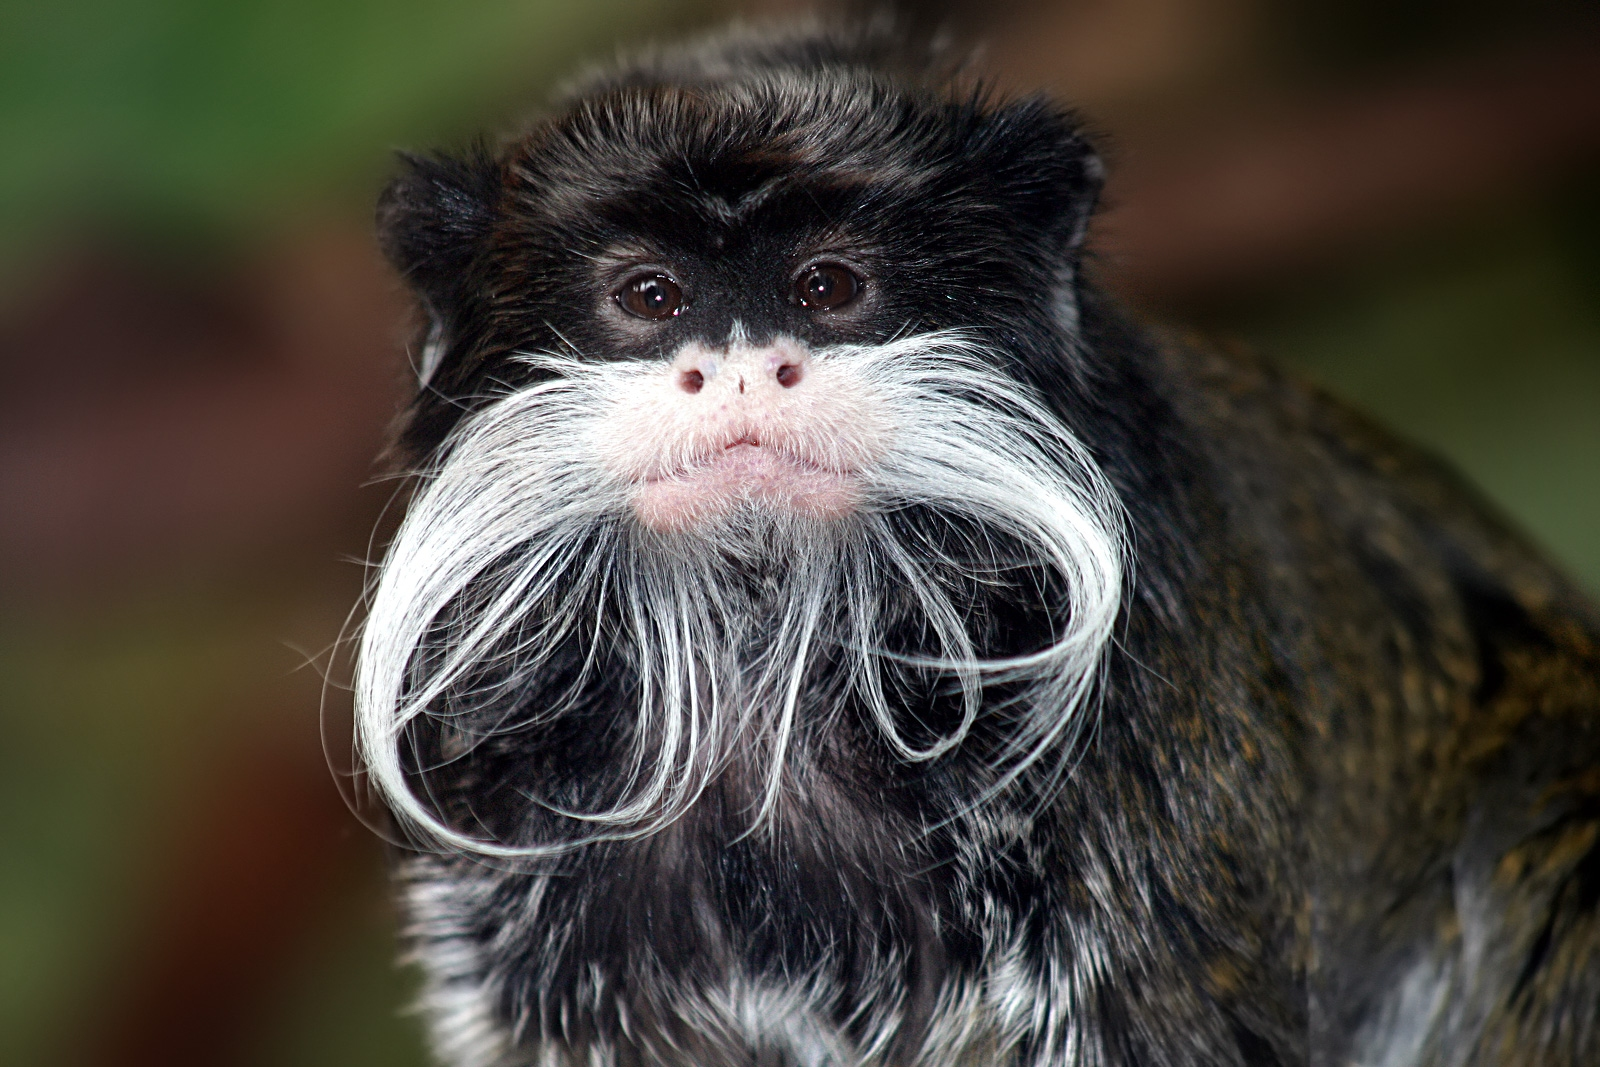 Emperor tamarin, a New World monkey